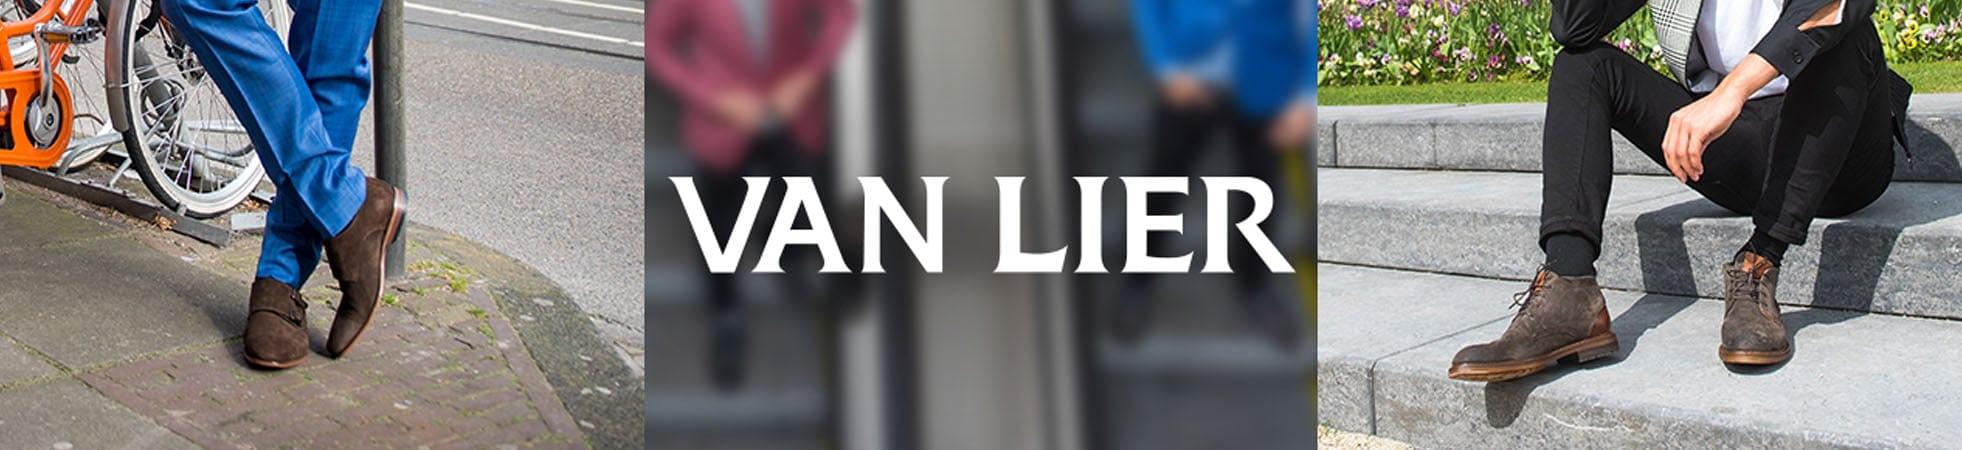 Van Lier Rotterdam online bestellen